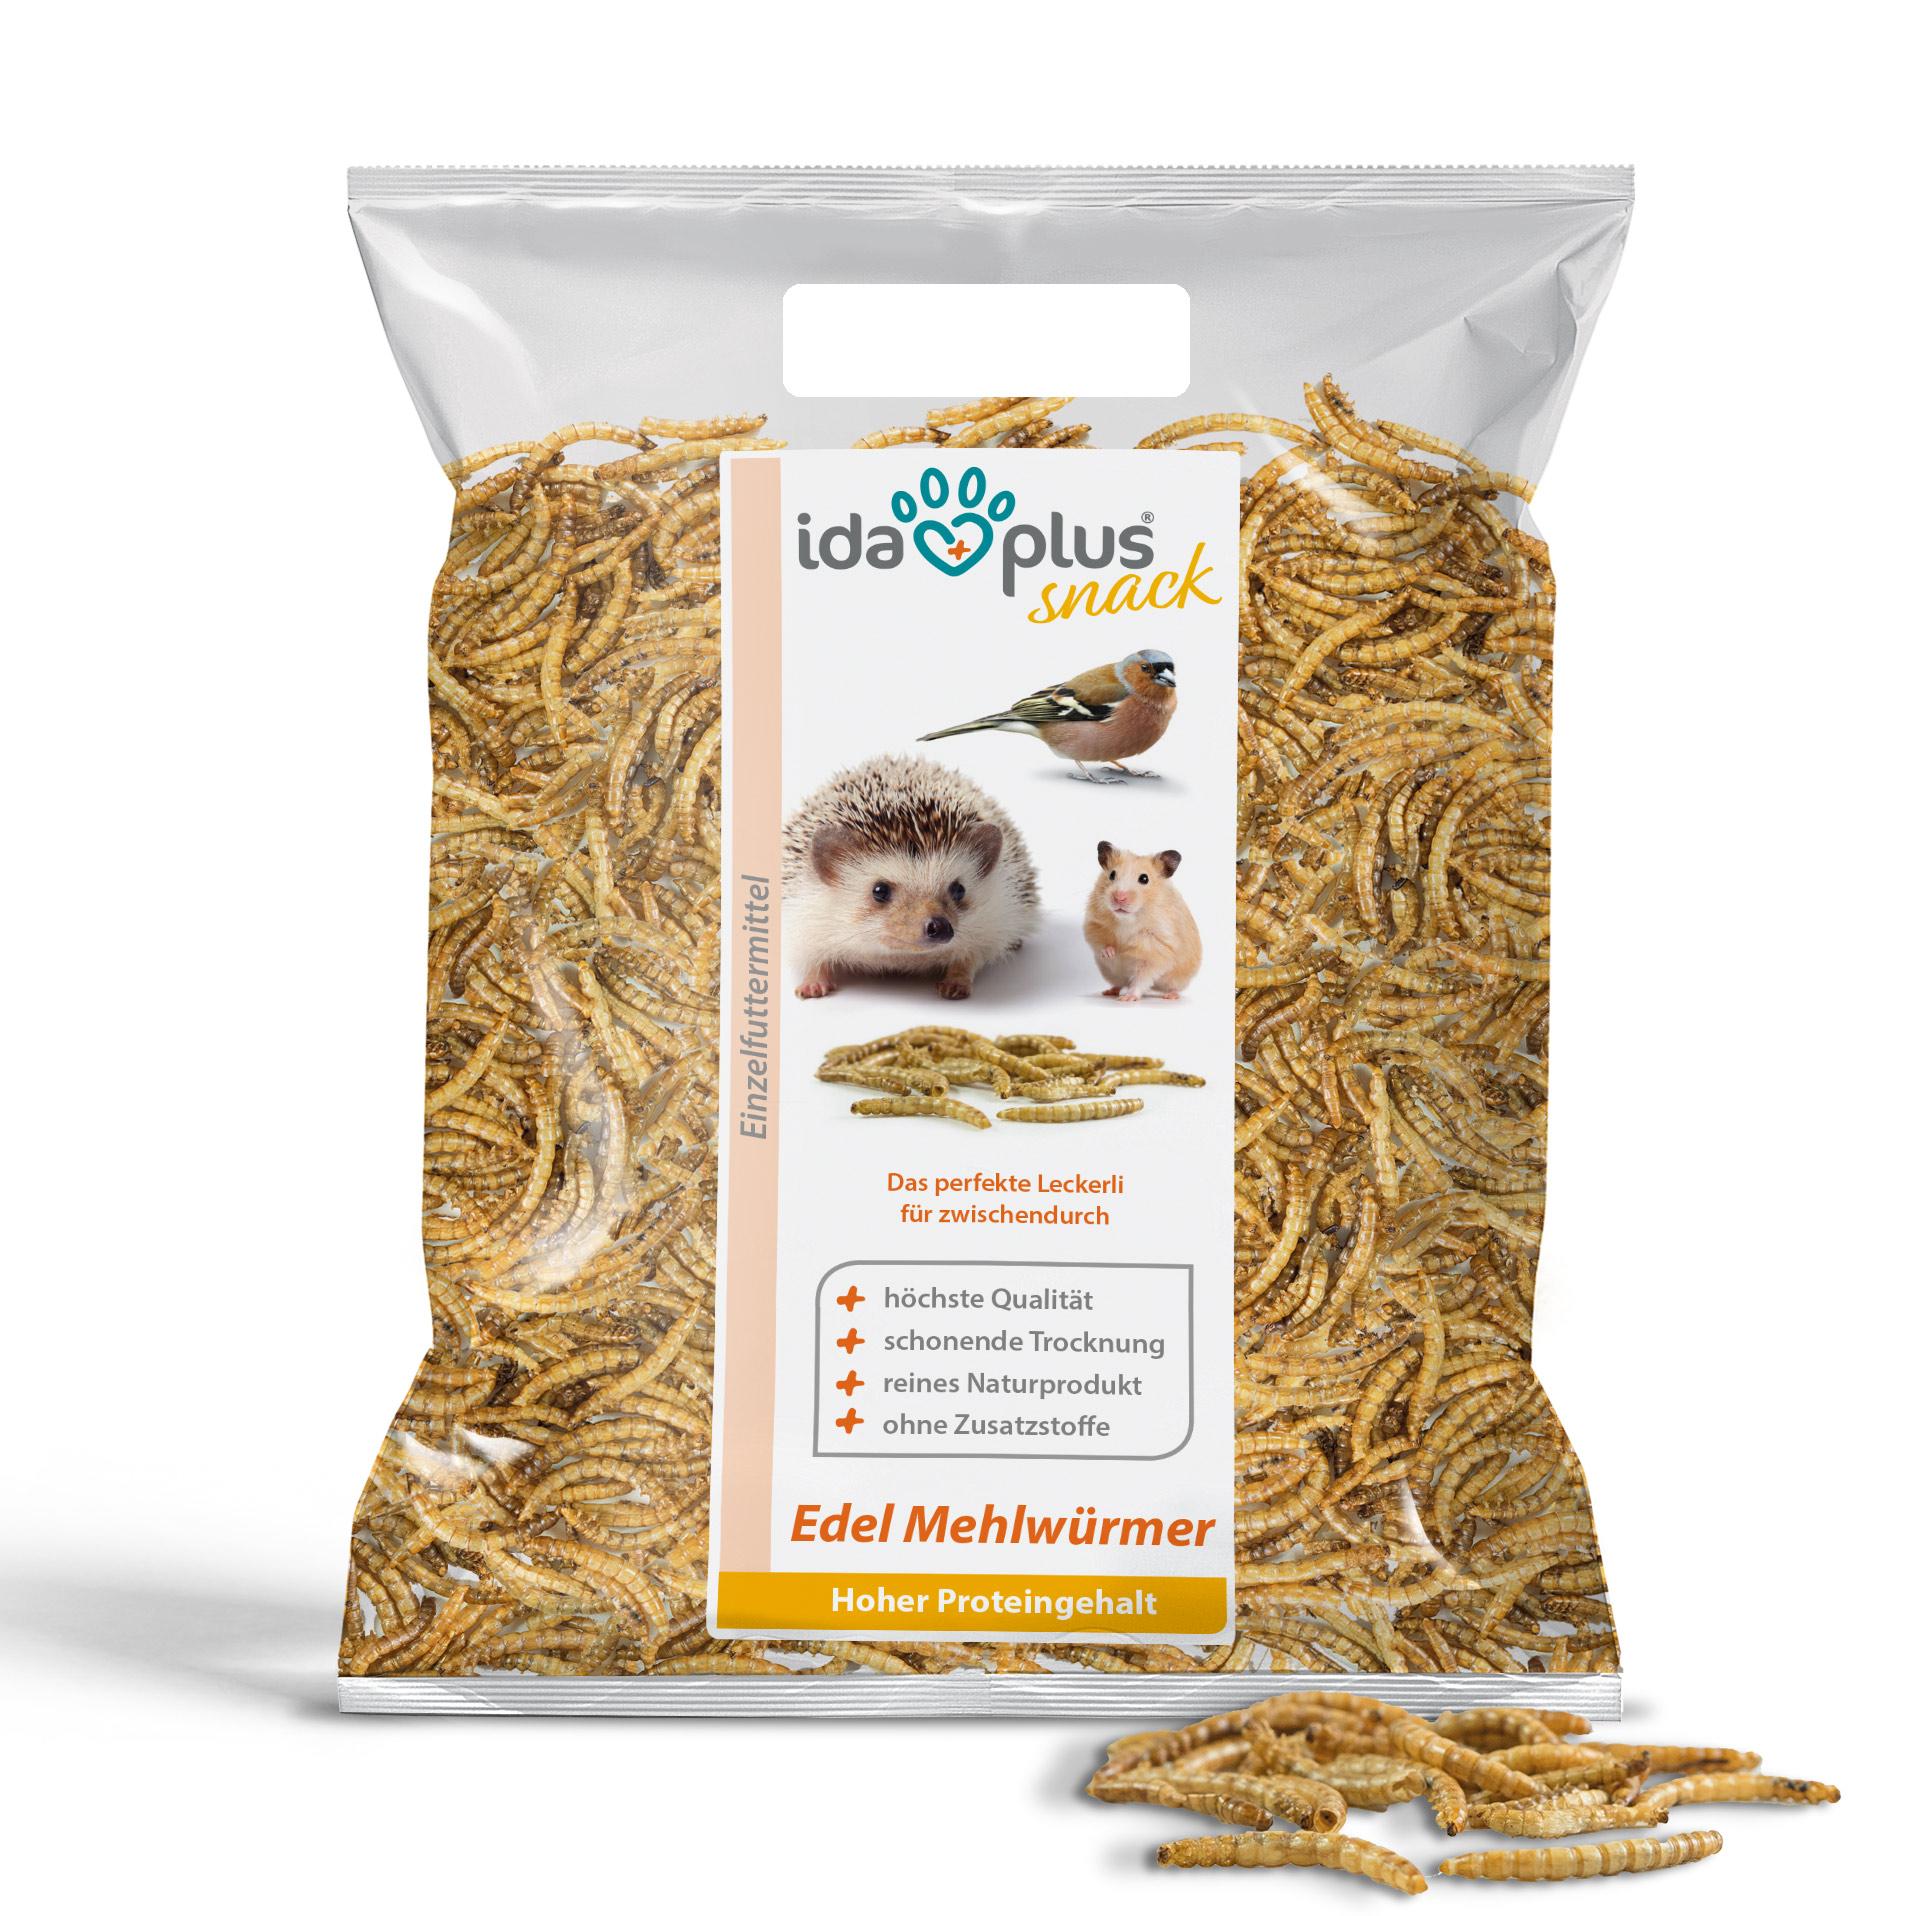 Edel Mehlwürmer getrocknet - Insekten Snack für Igel, Hamster und Reptilien - 1kg